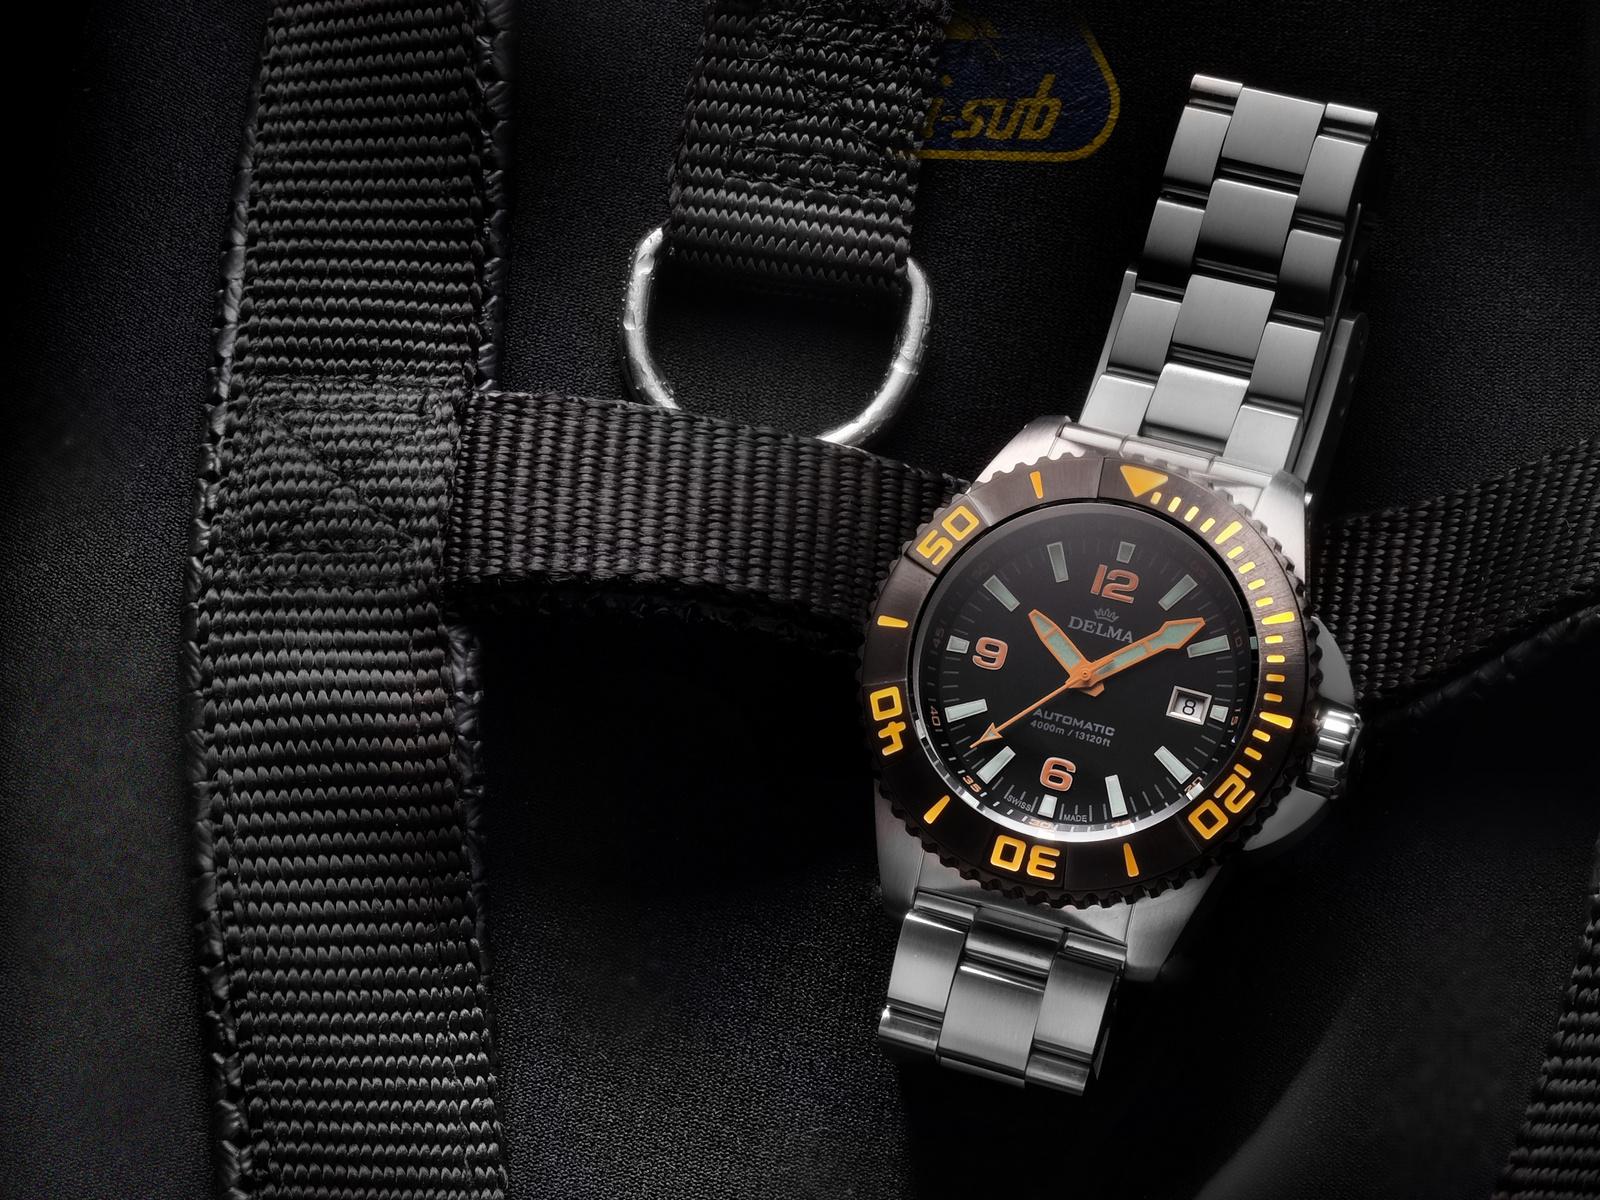 BlueShark_III_Black on black gear